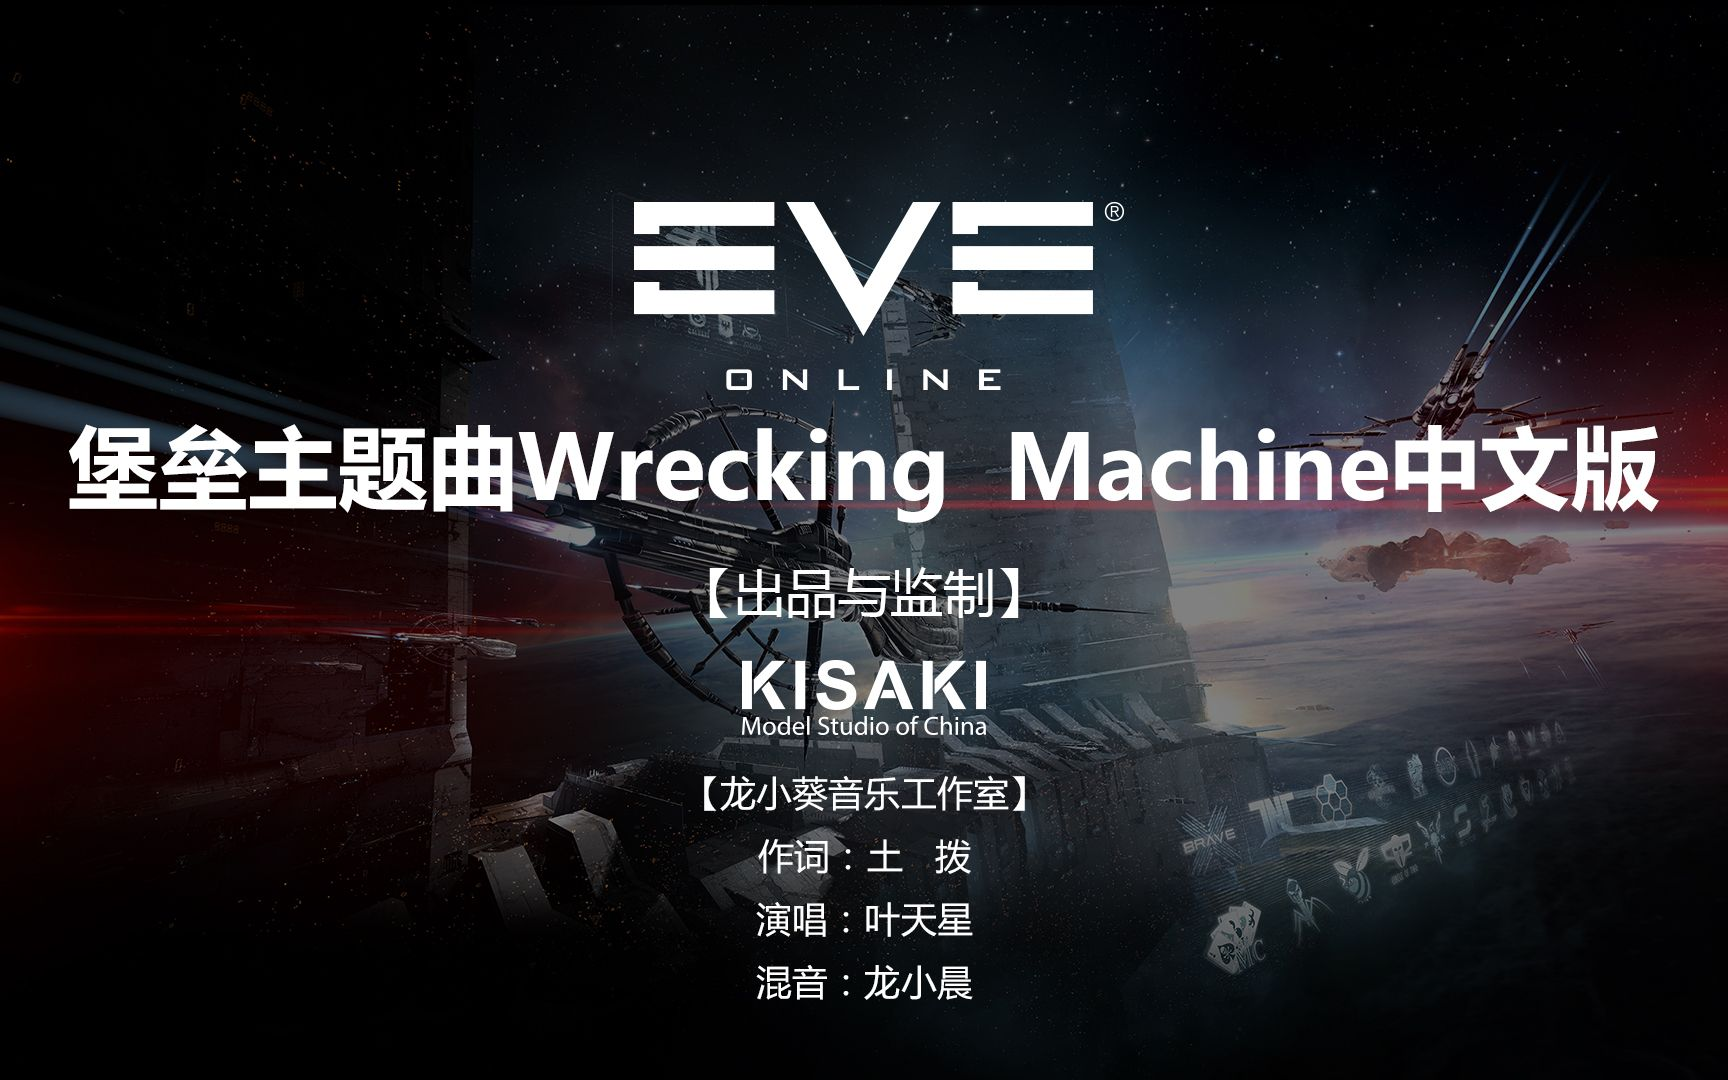 eve星战前夜宣传片_EVE堡垒主题曲——Wrecking Machine中文版MV_哔哩哔哩 (゜-゜)つロ 干 ...